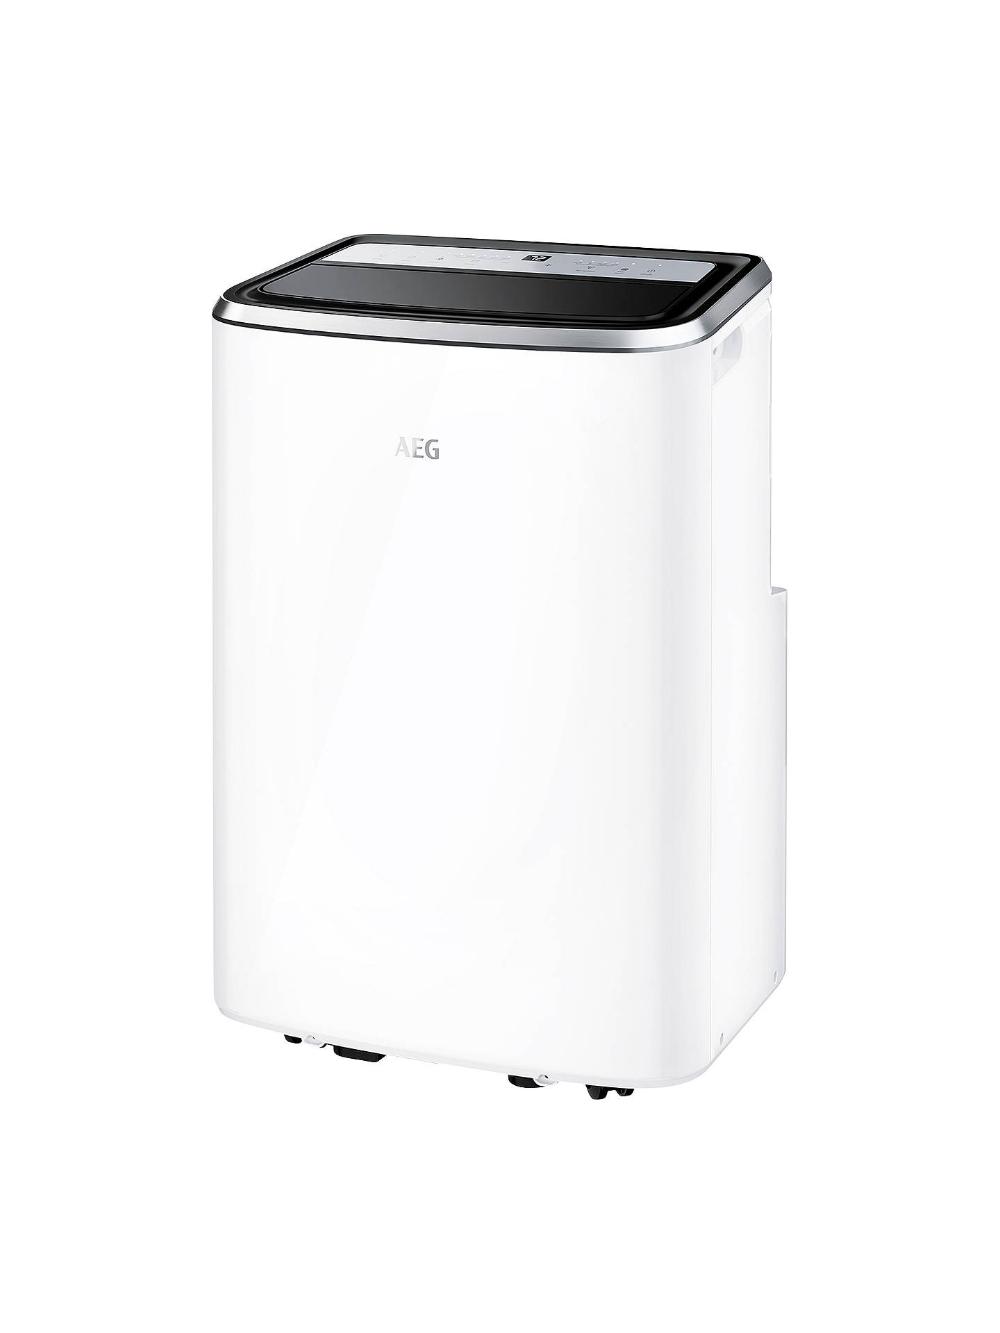 AEG ChillFlex Pro AXP26U338CW Portable Air Conditioner